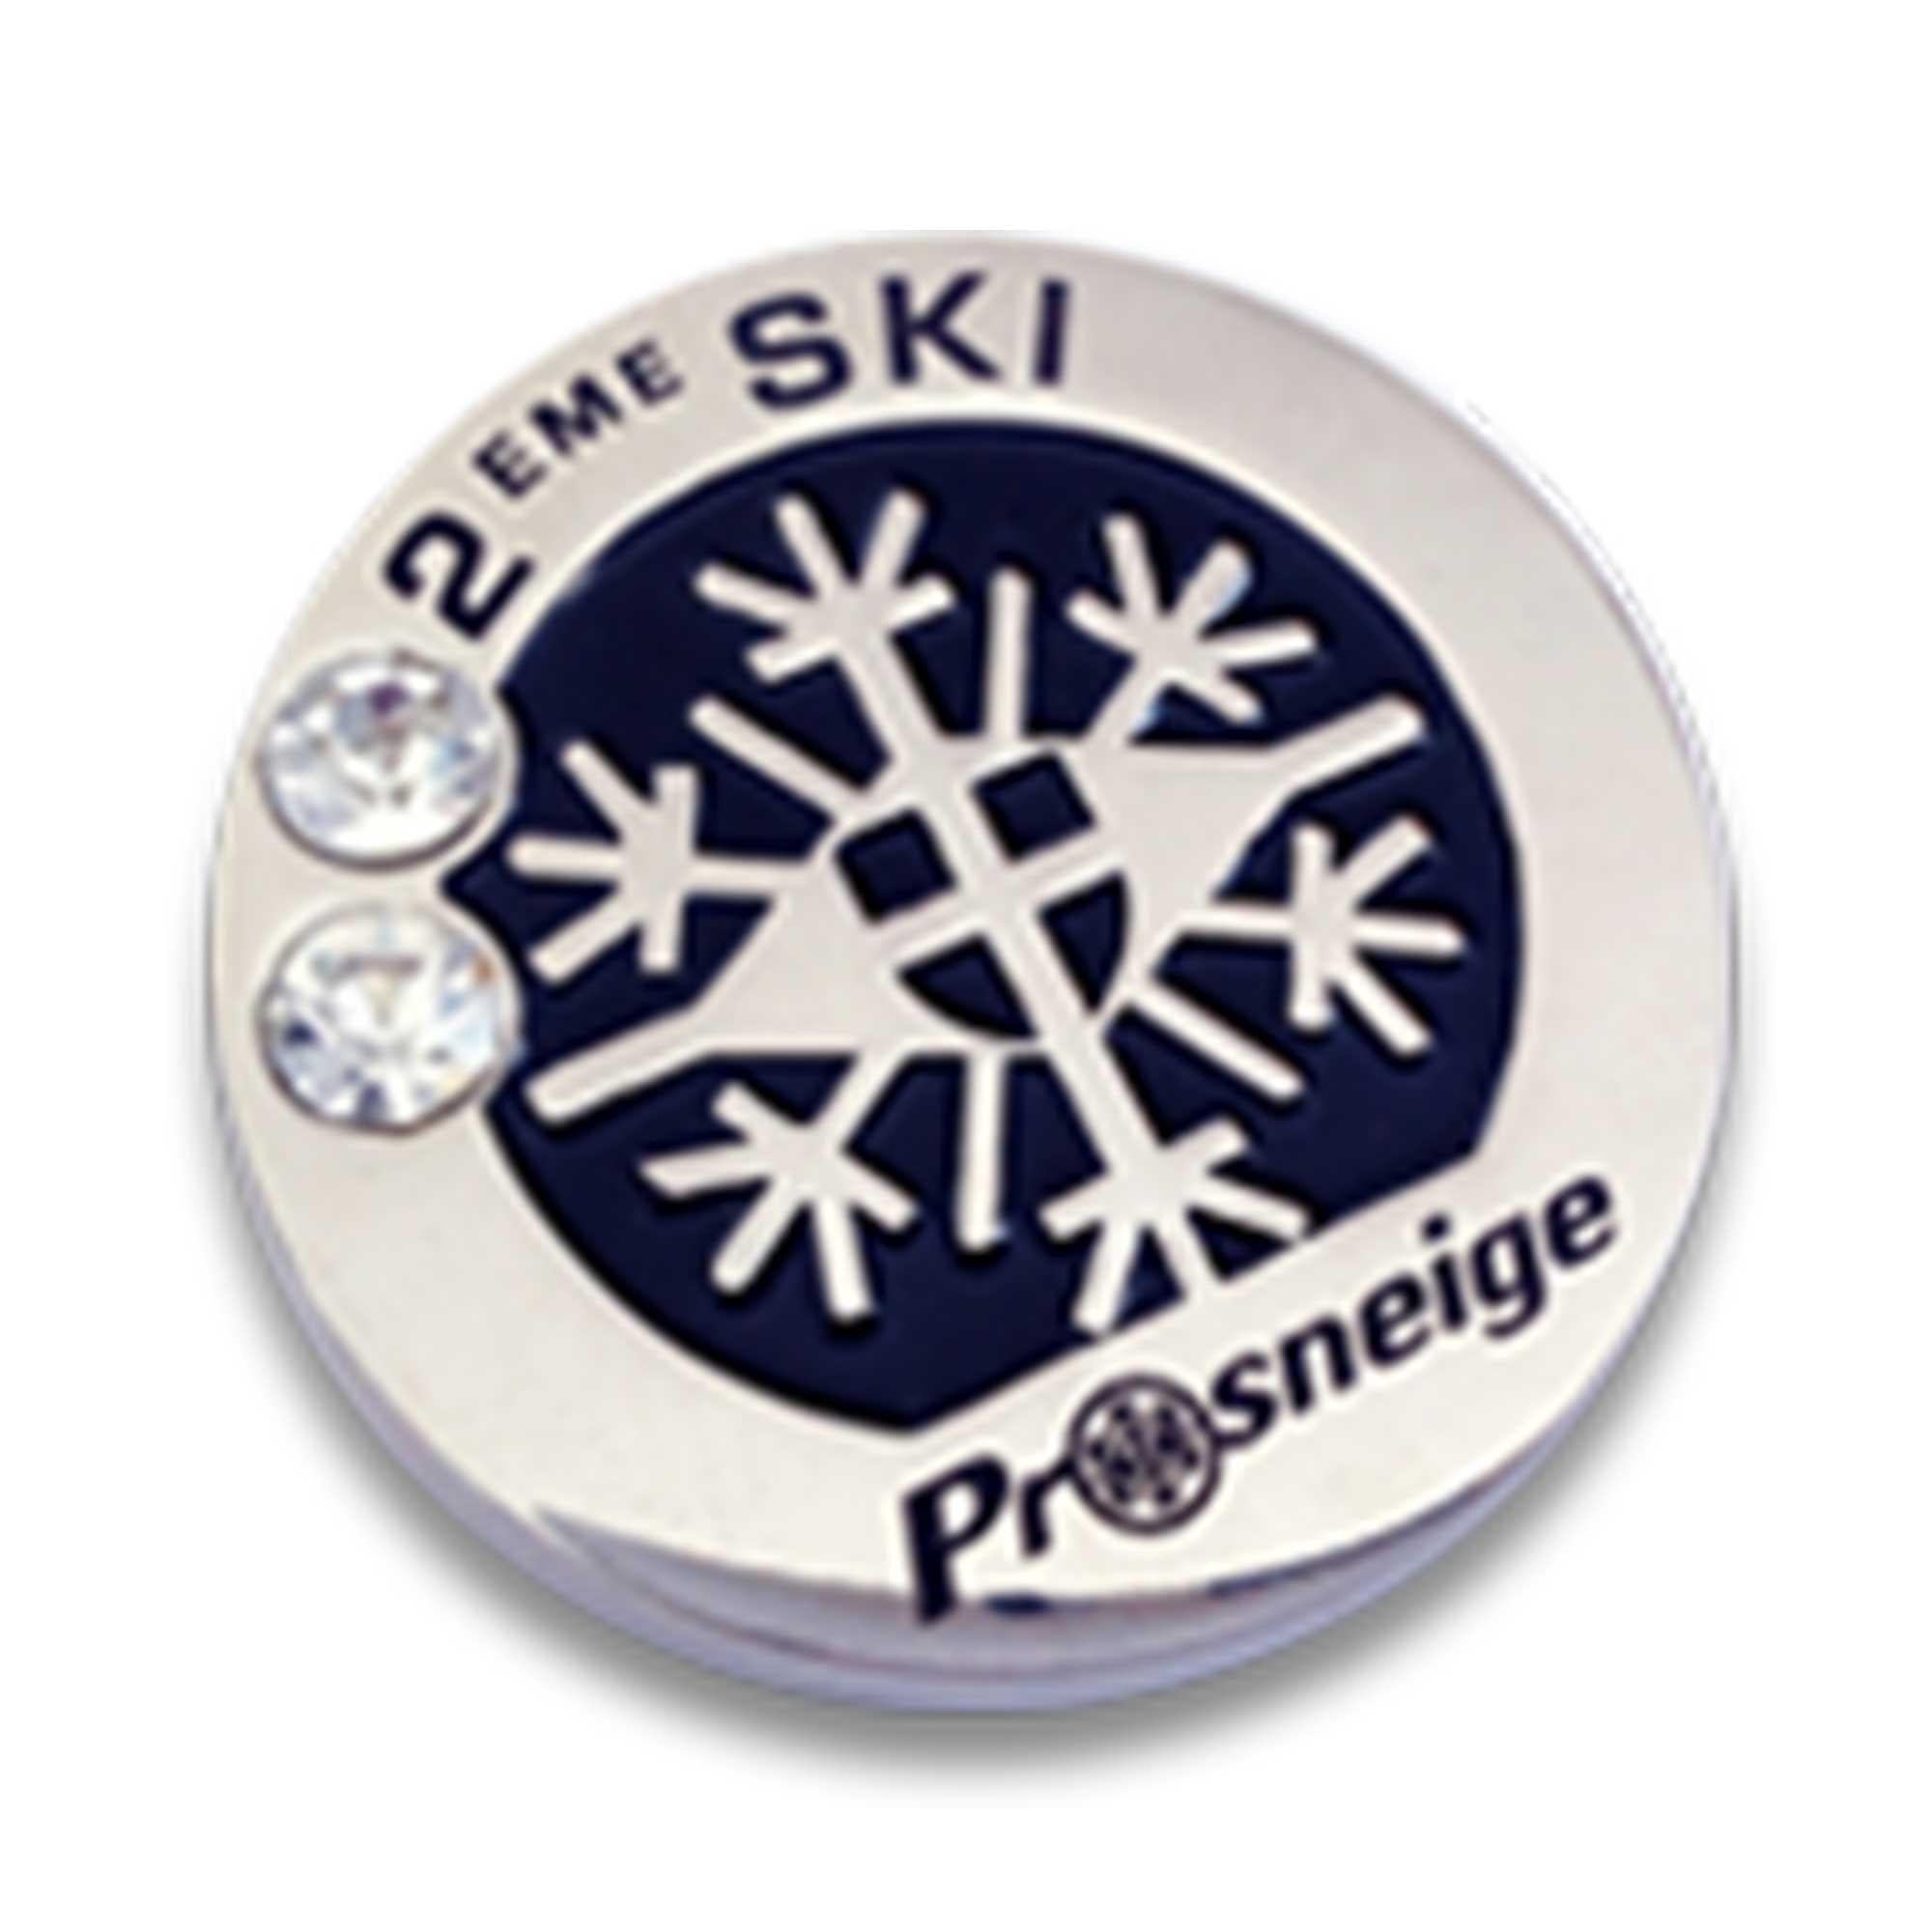 Quel niveau choisir enfant 2eme ski